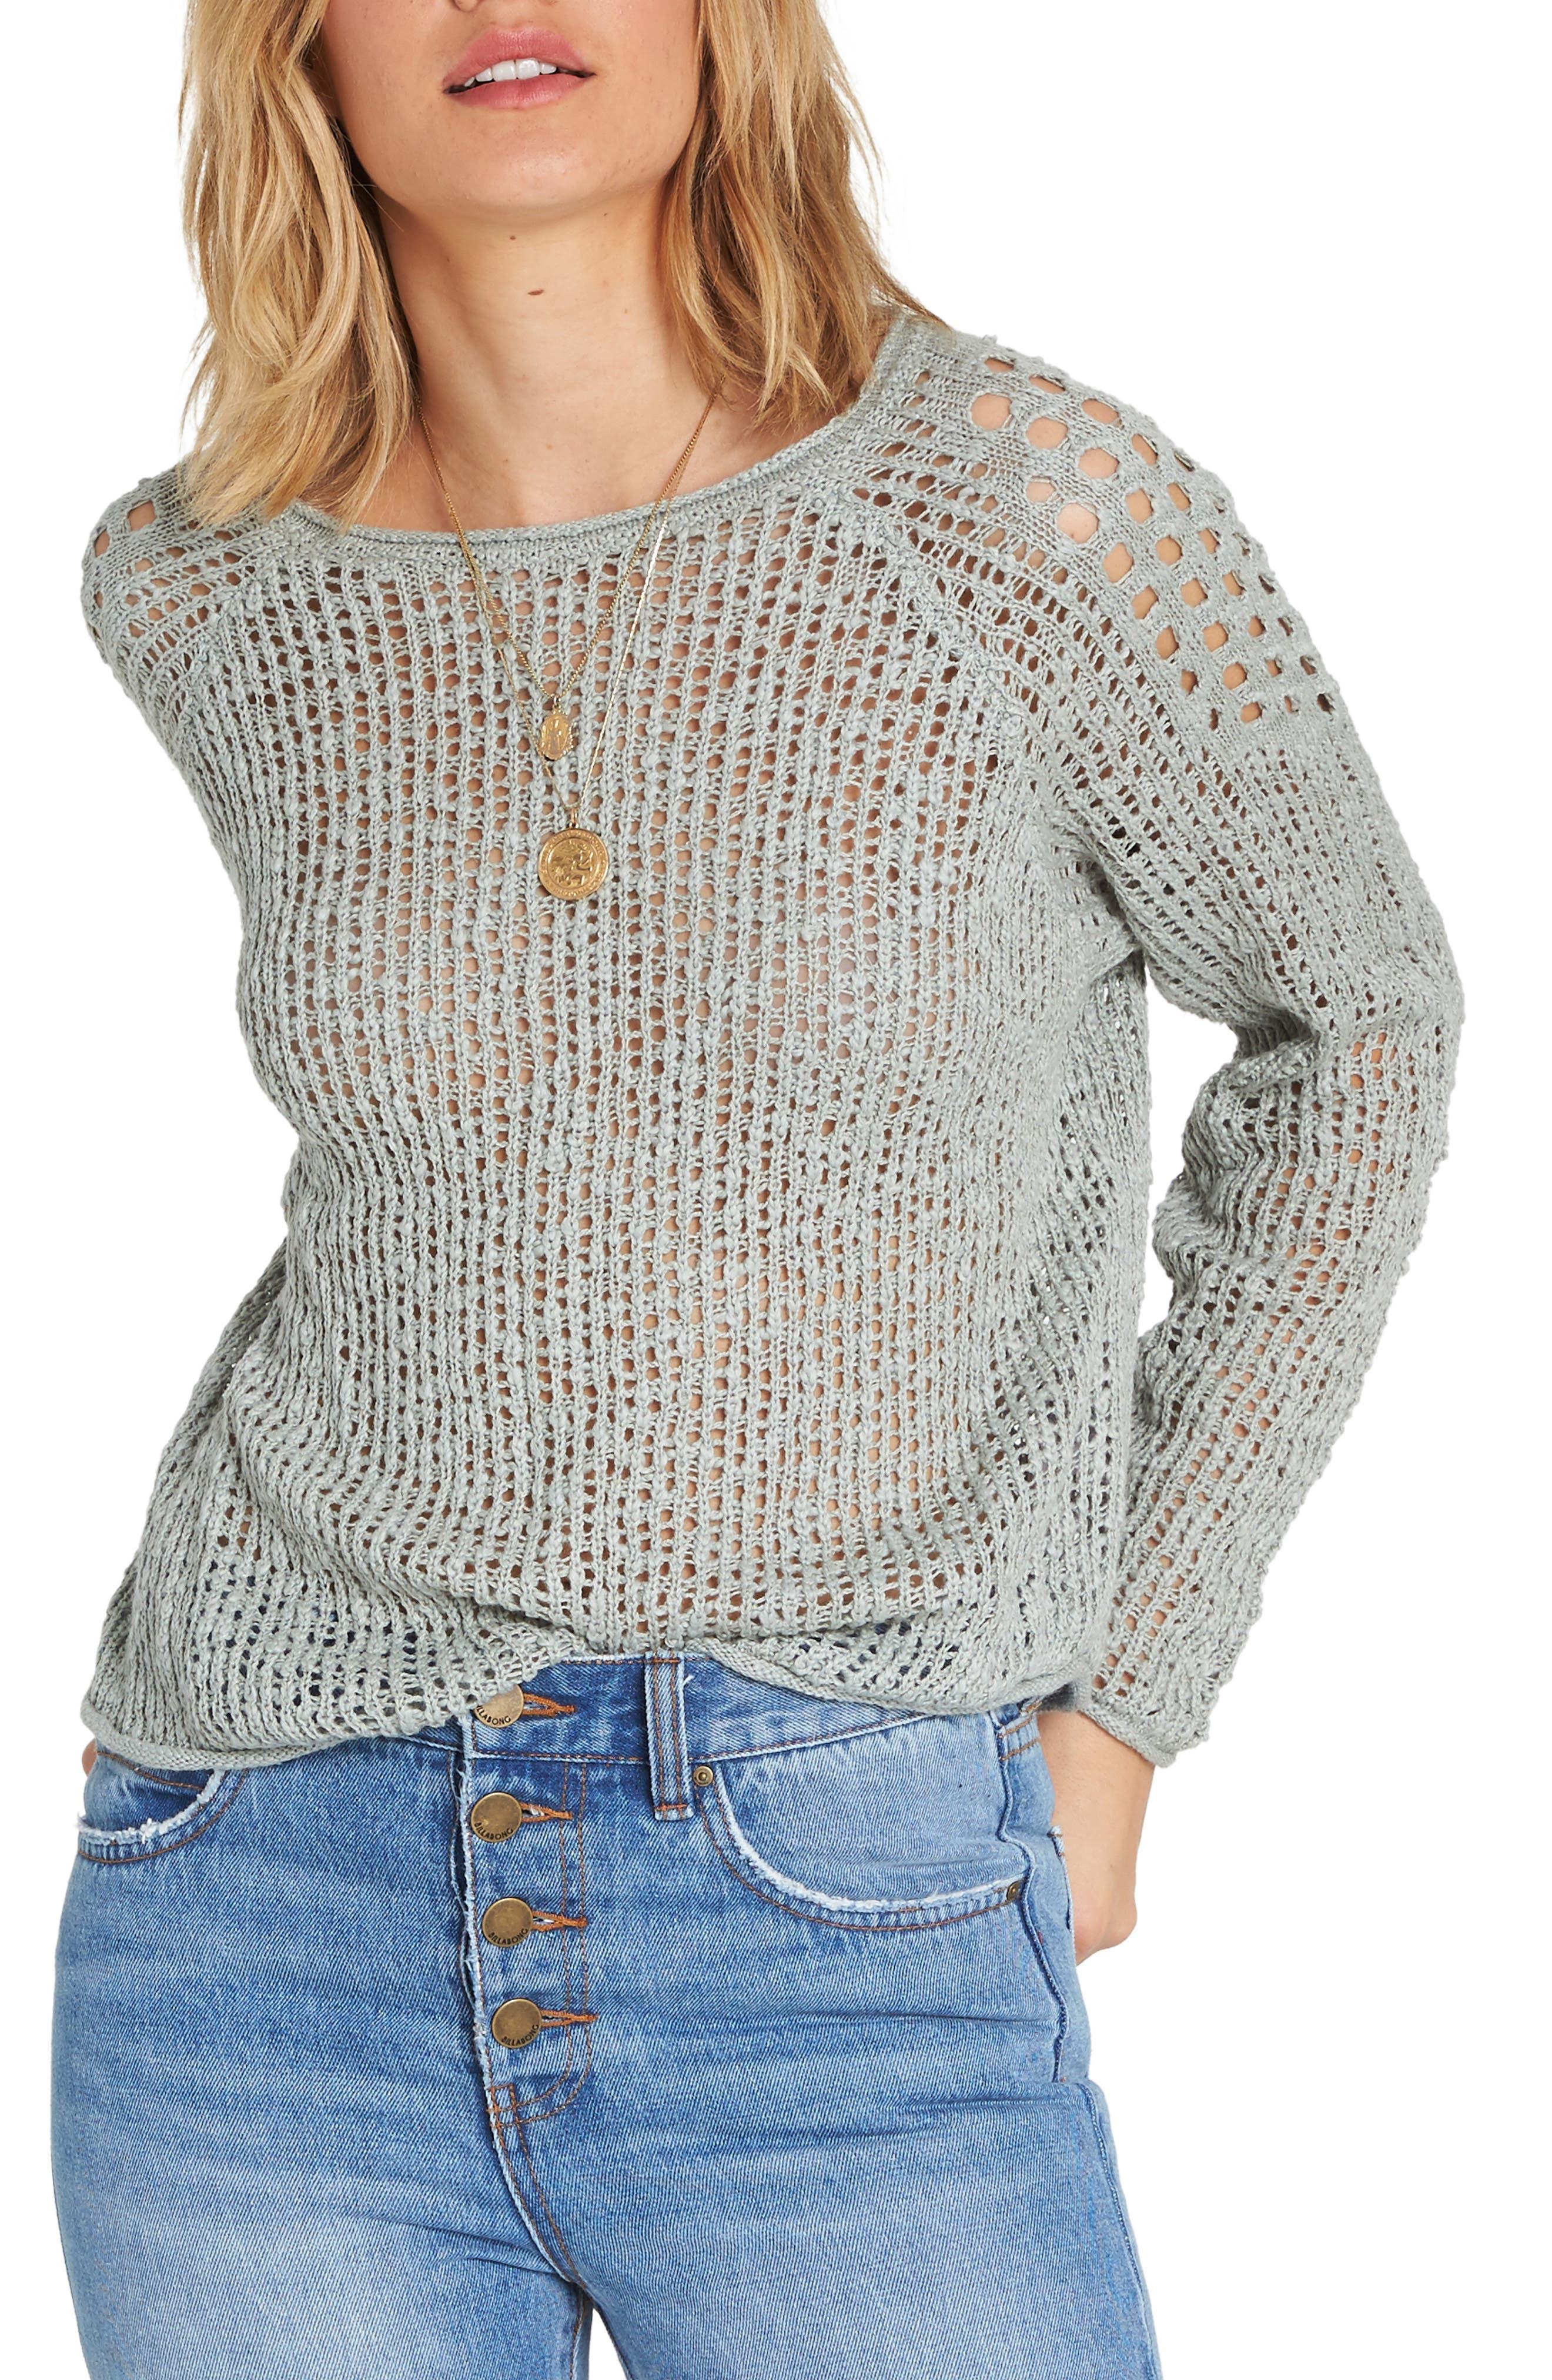 Sea Ya Soon Sweater,                         Main,                         color, Blue Light